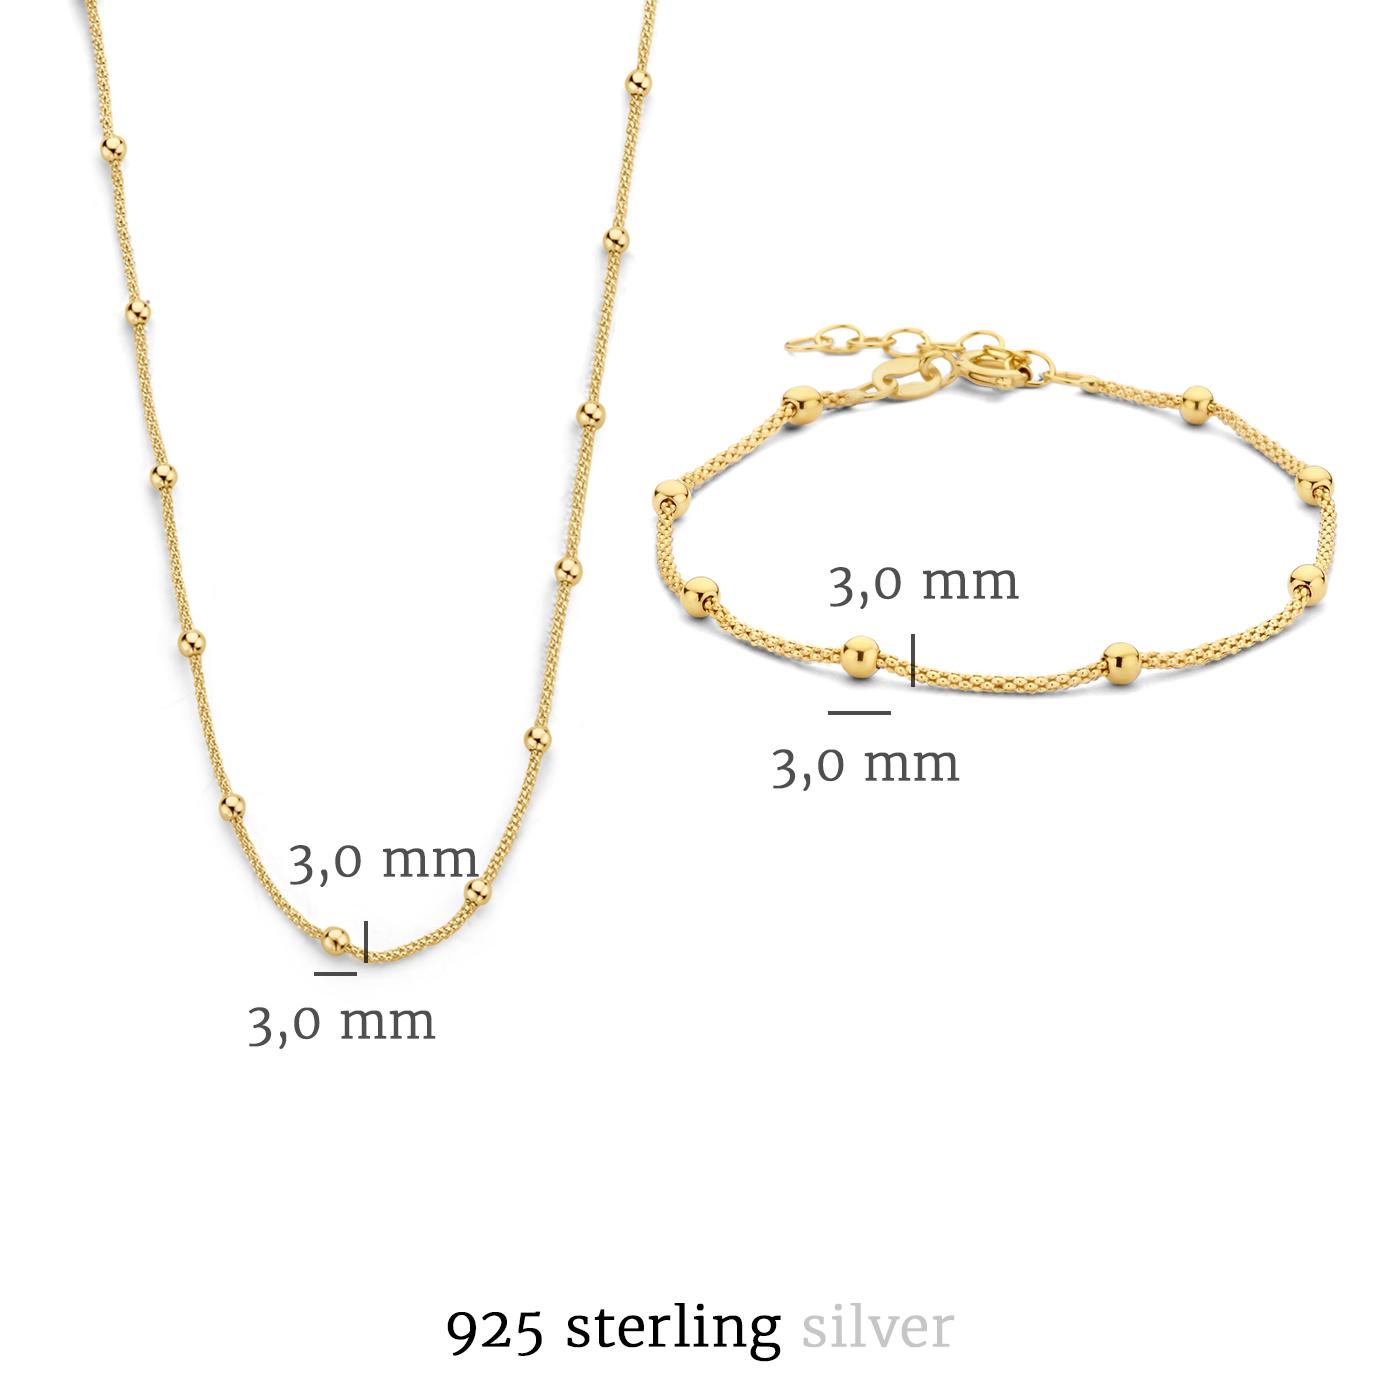 Selected Jewels Selected Gifts ensemble bracelet et collier couleur or en argent sterling 925